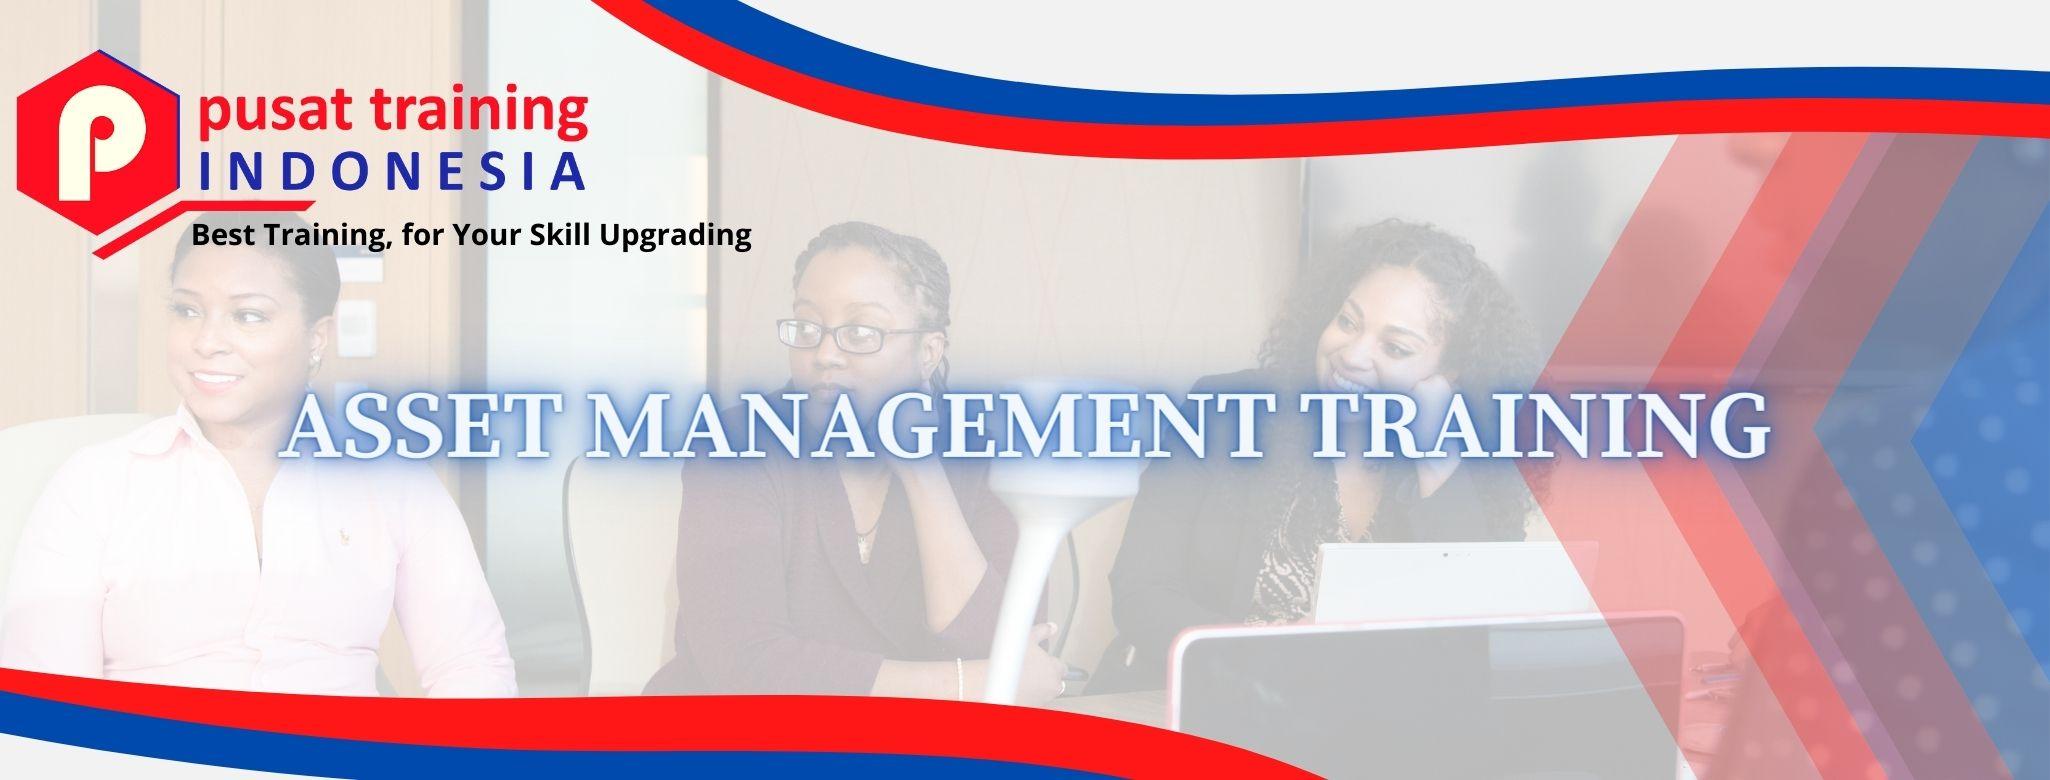 asset-management-training